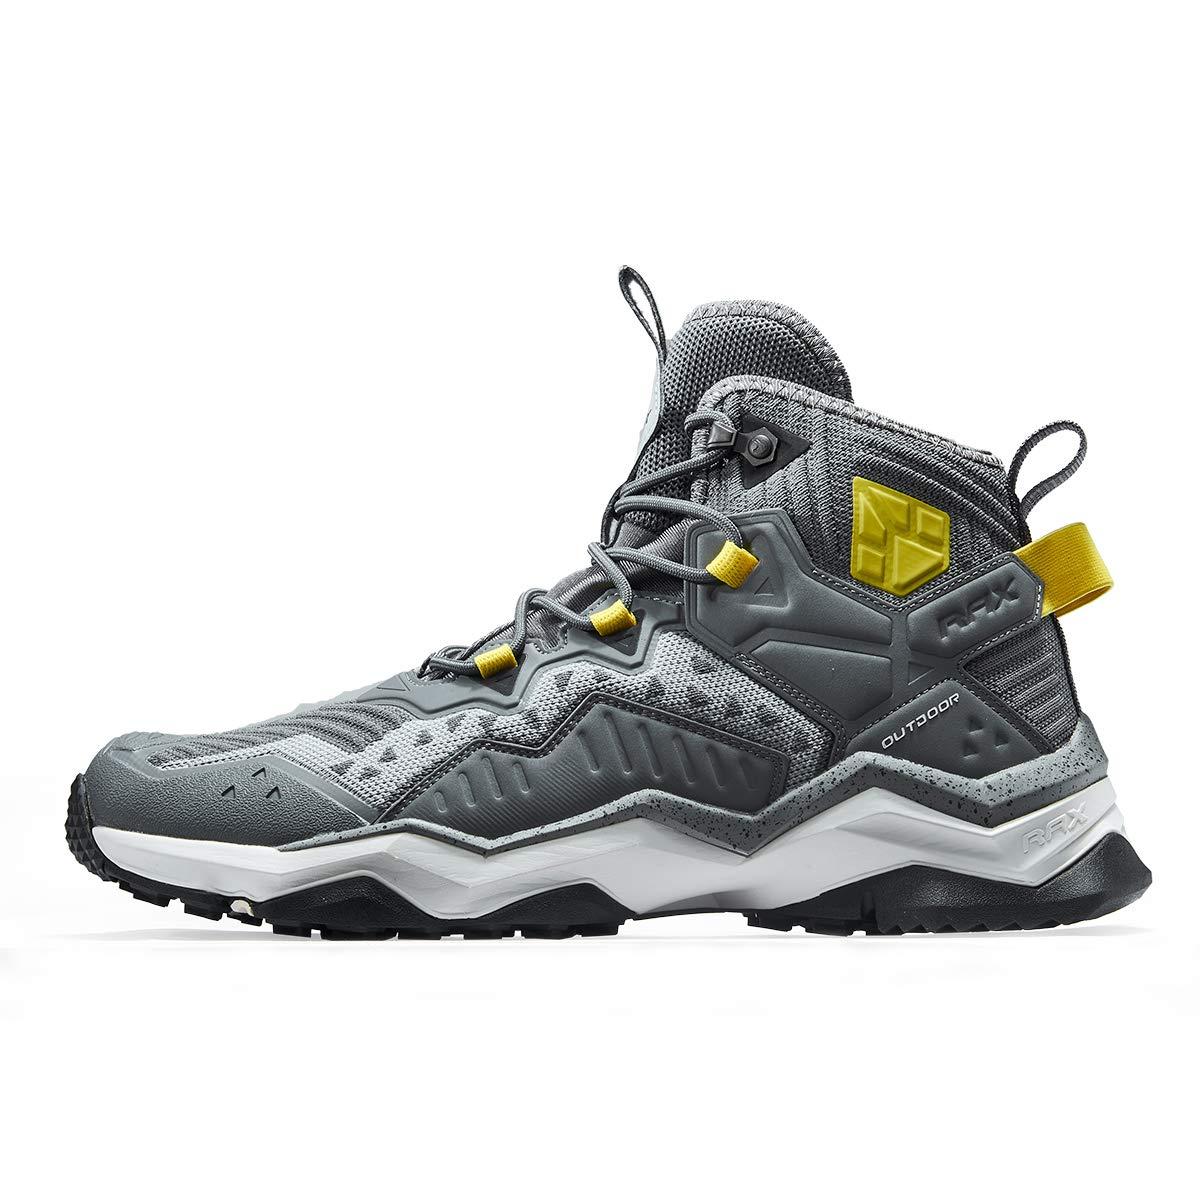 RAX Men's Jungle Wolf Waterproof Hiking Boot Camping Backpacking Shoe 12 US Grey by RAX